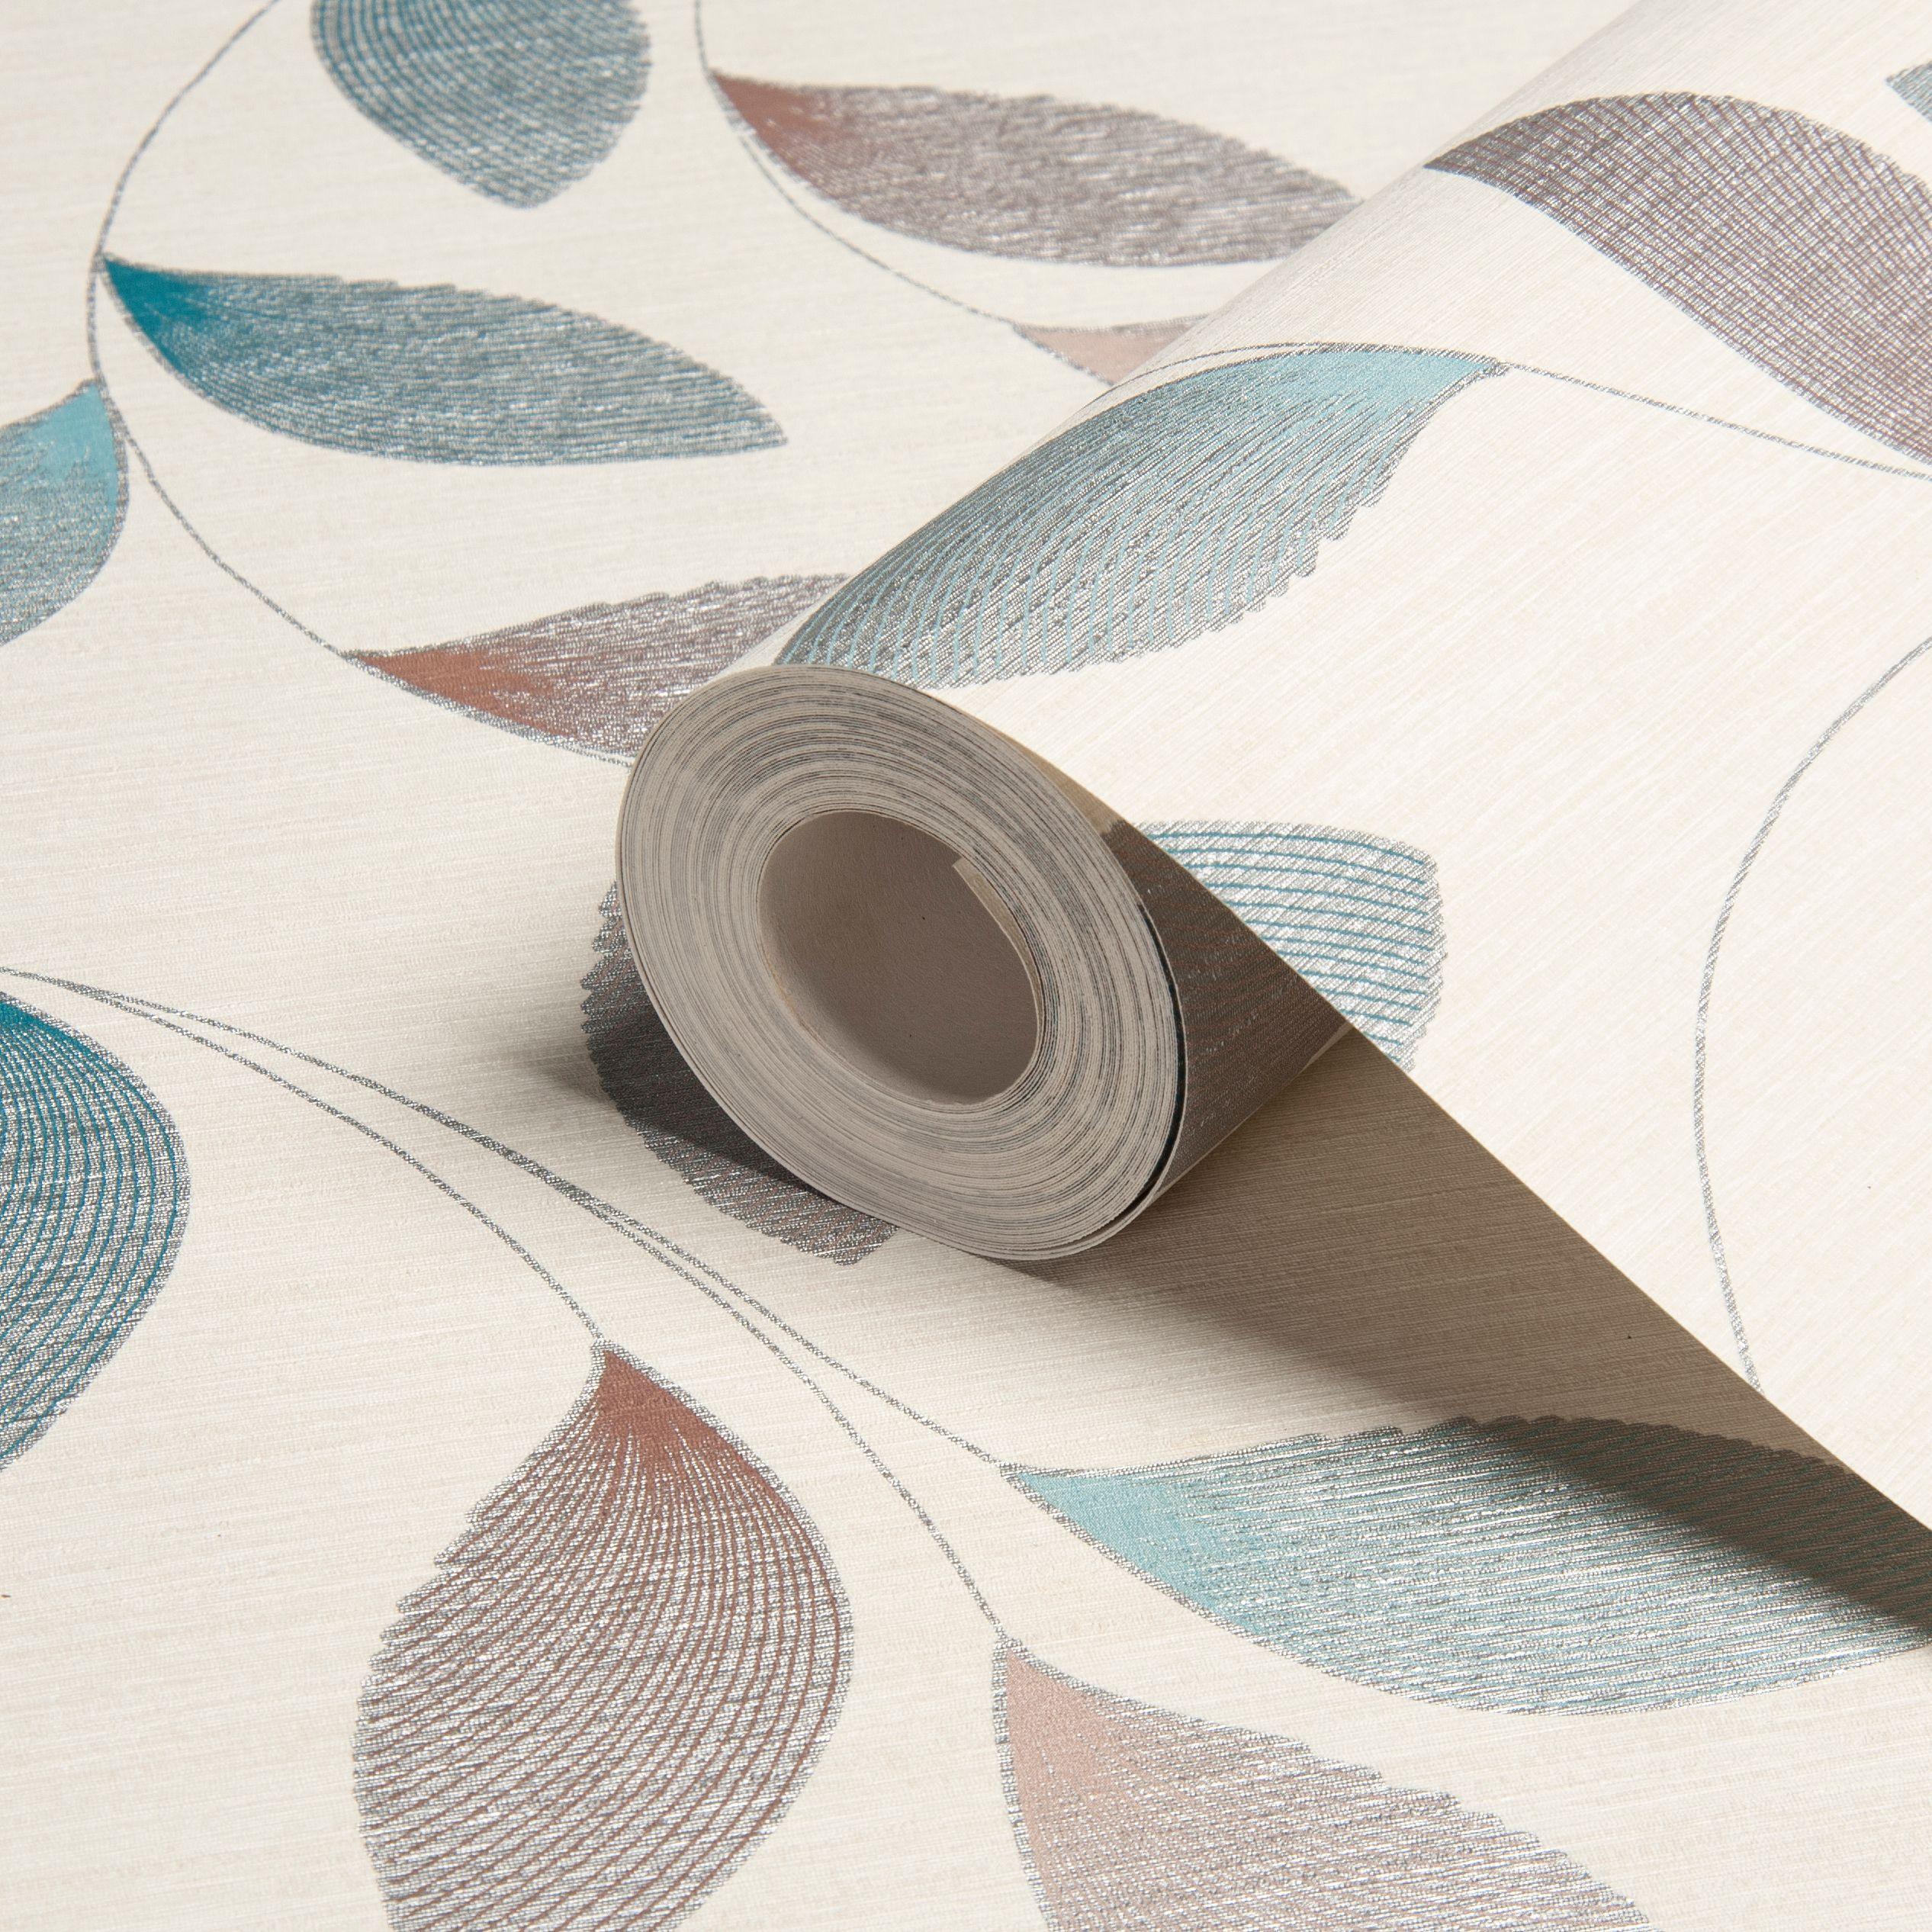 Home diy wallpaper illustration arthouse imagine fern plum motif vinyl - A S Creation Adrianna Motif Brown Cream Turquoise Leaf Wallpaper